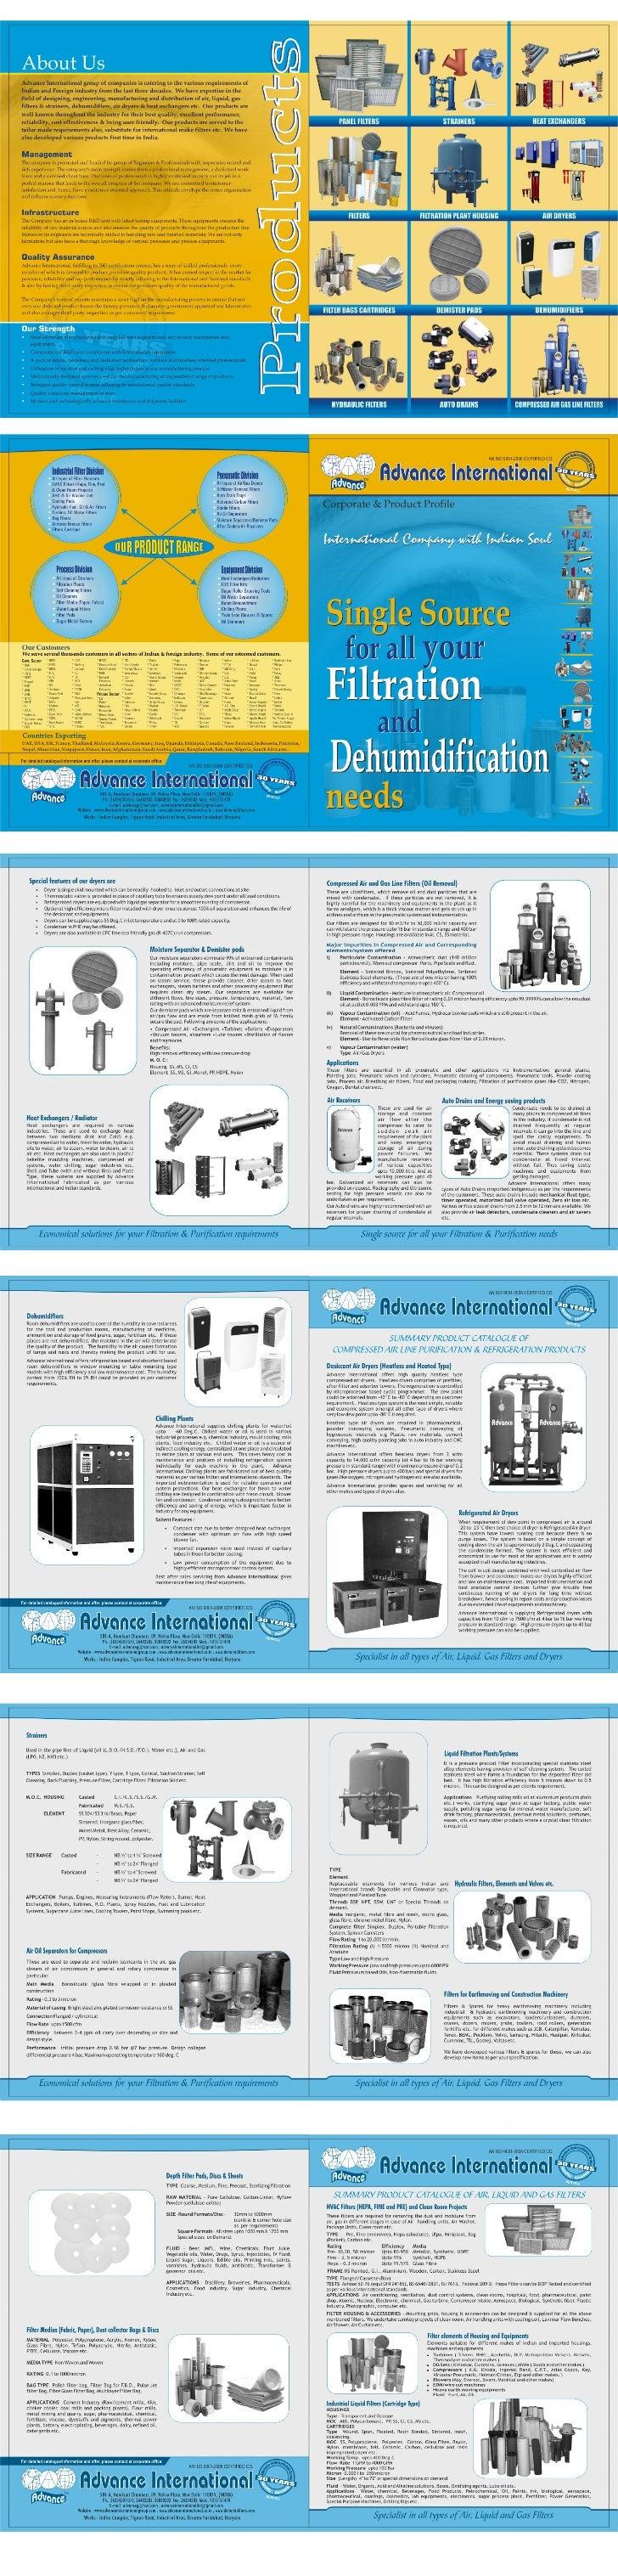 Advance International, New Delhi, Panel Filters